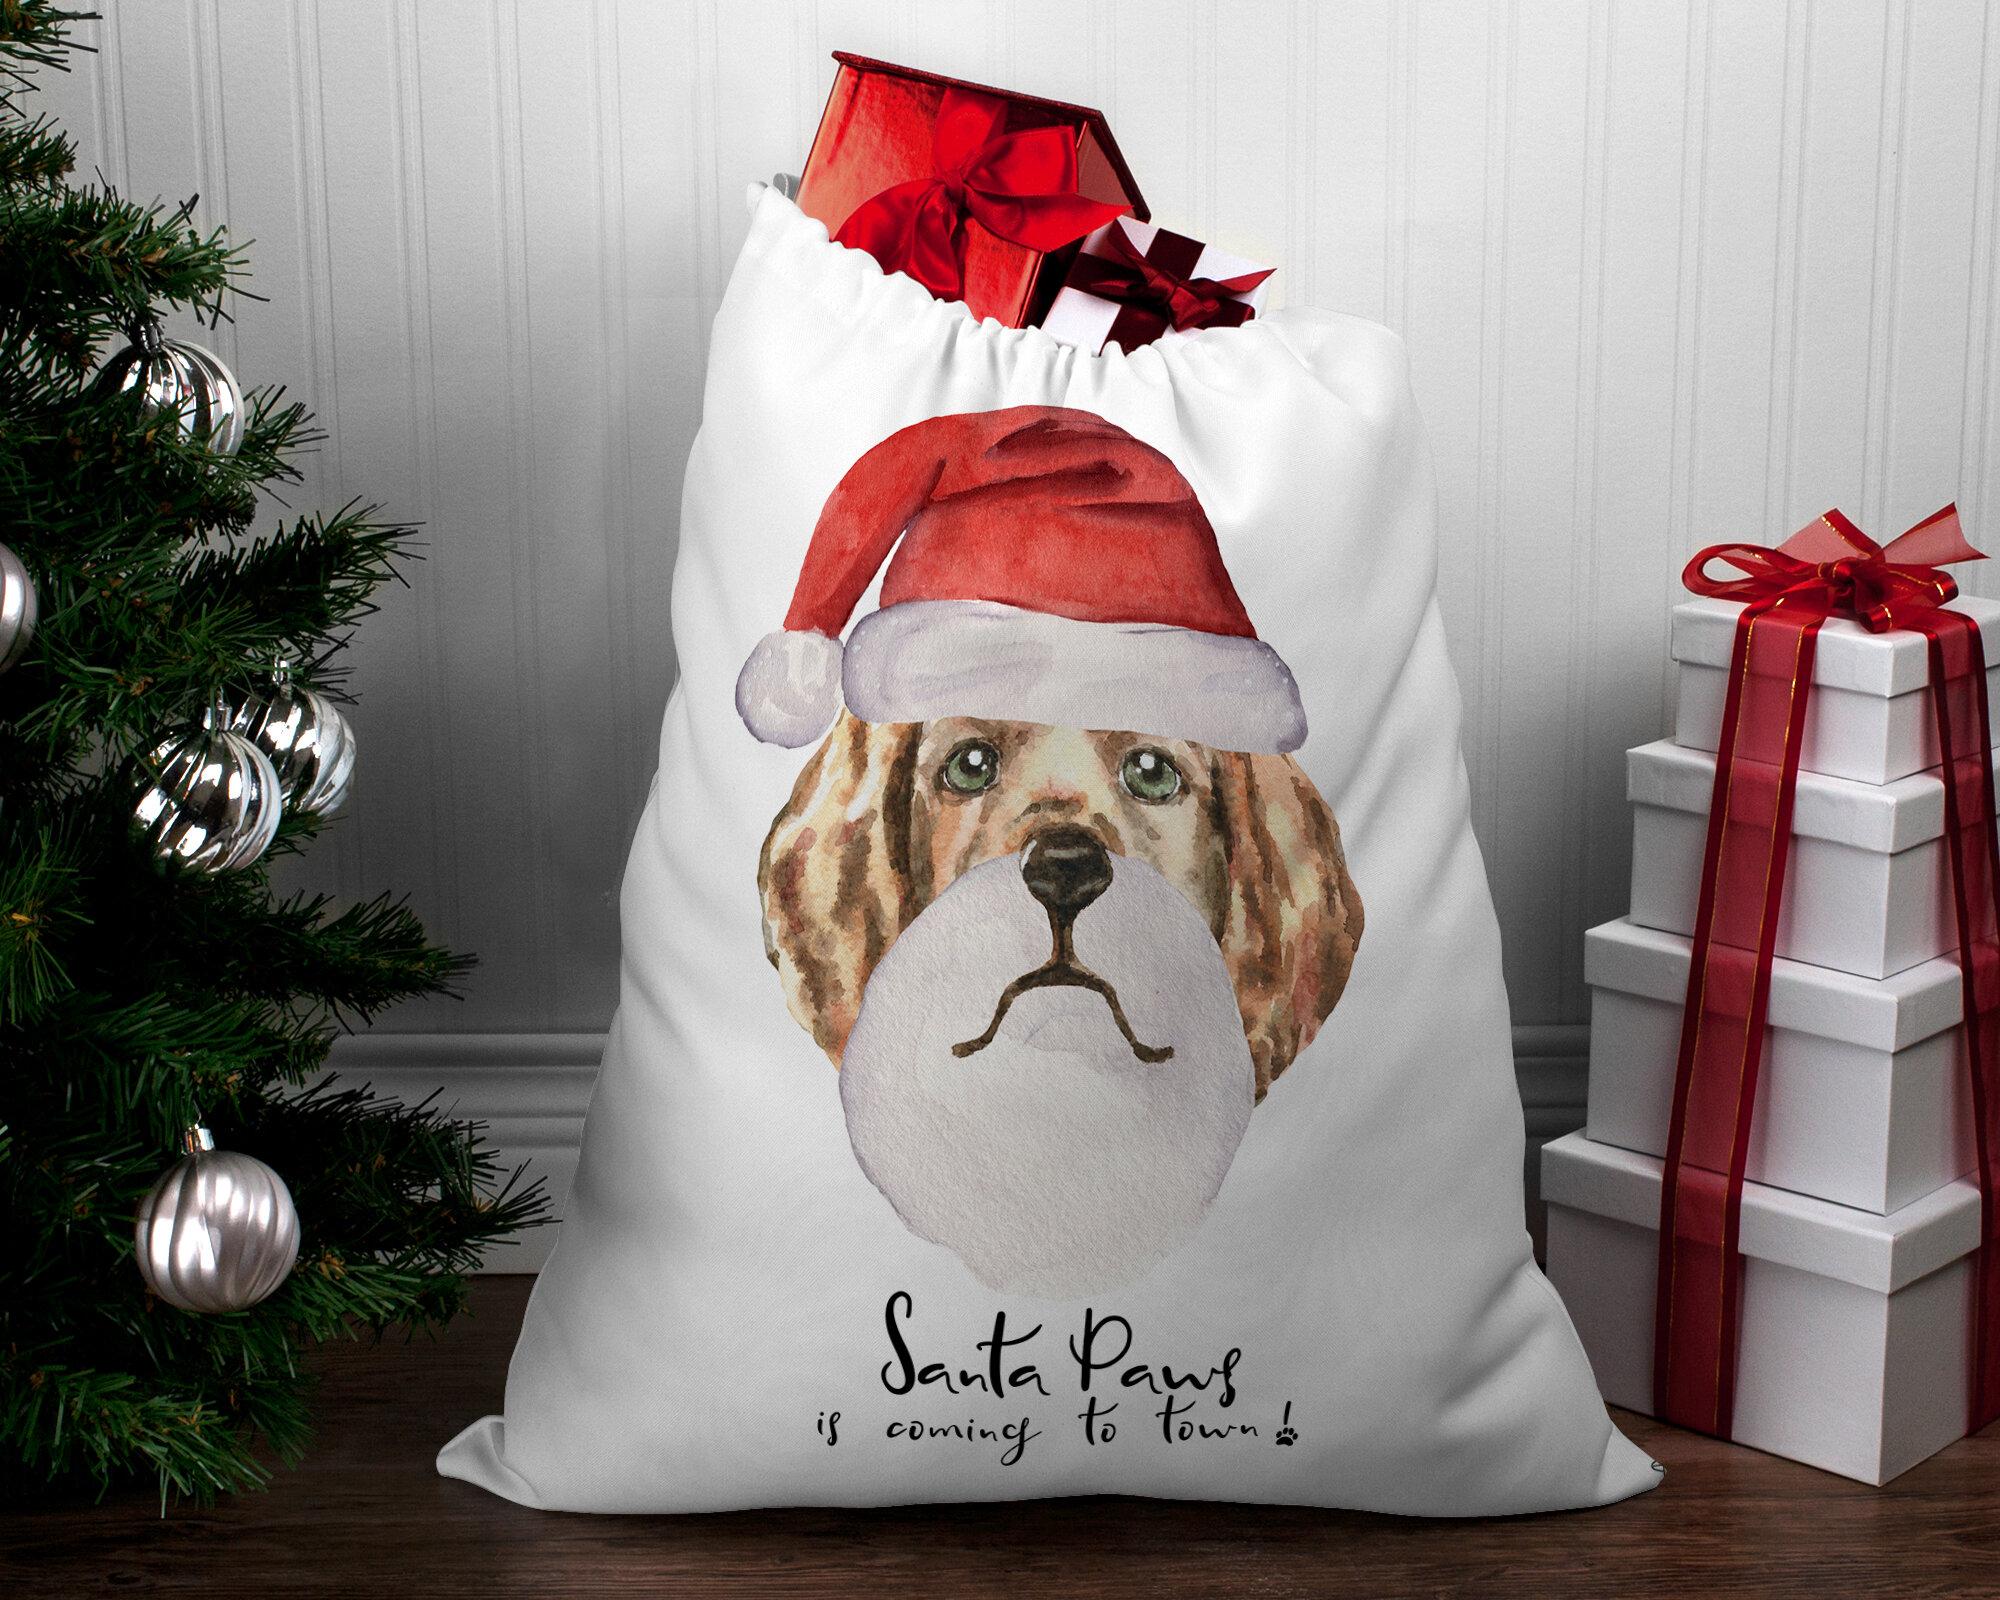 Kavka Santa Paws Is Coming To Town Santa Bag By Terri Ellis Wayfair